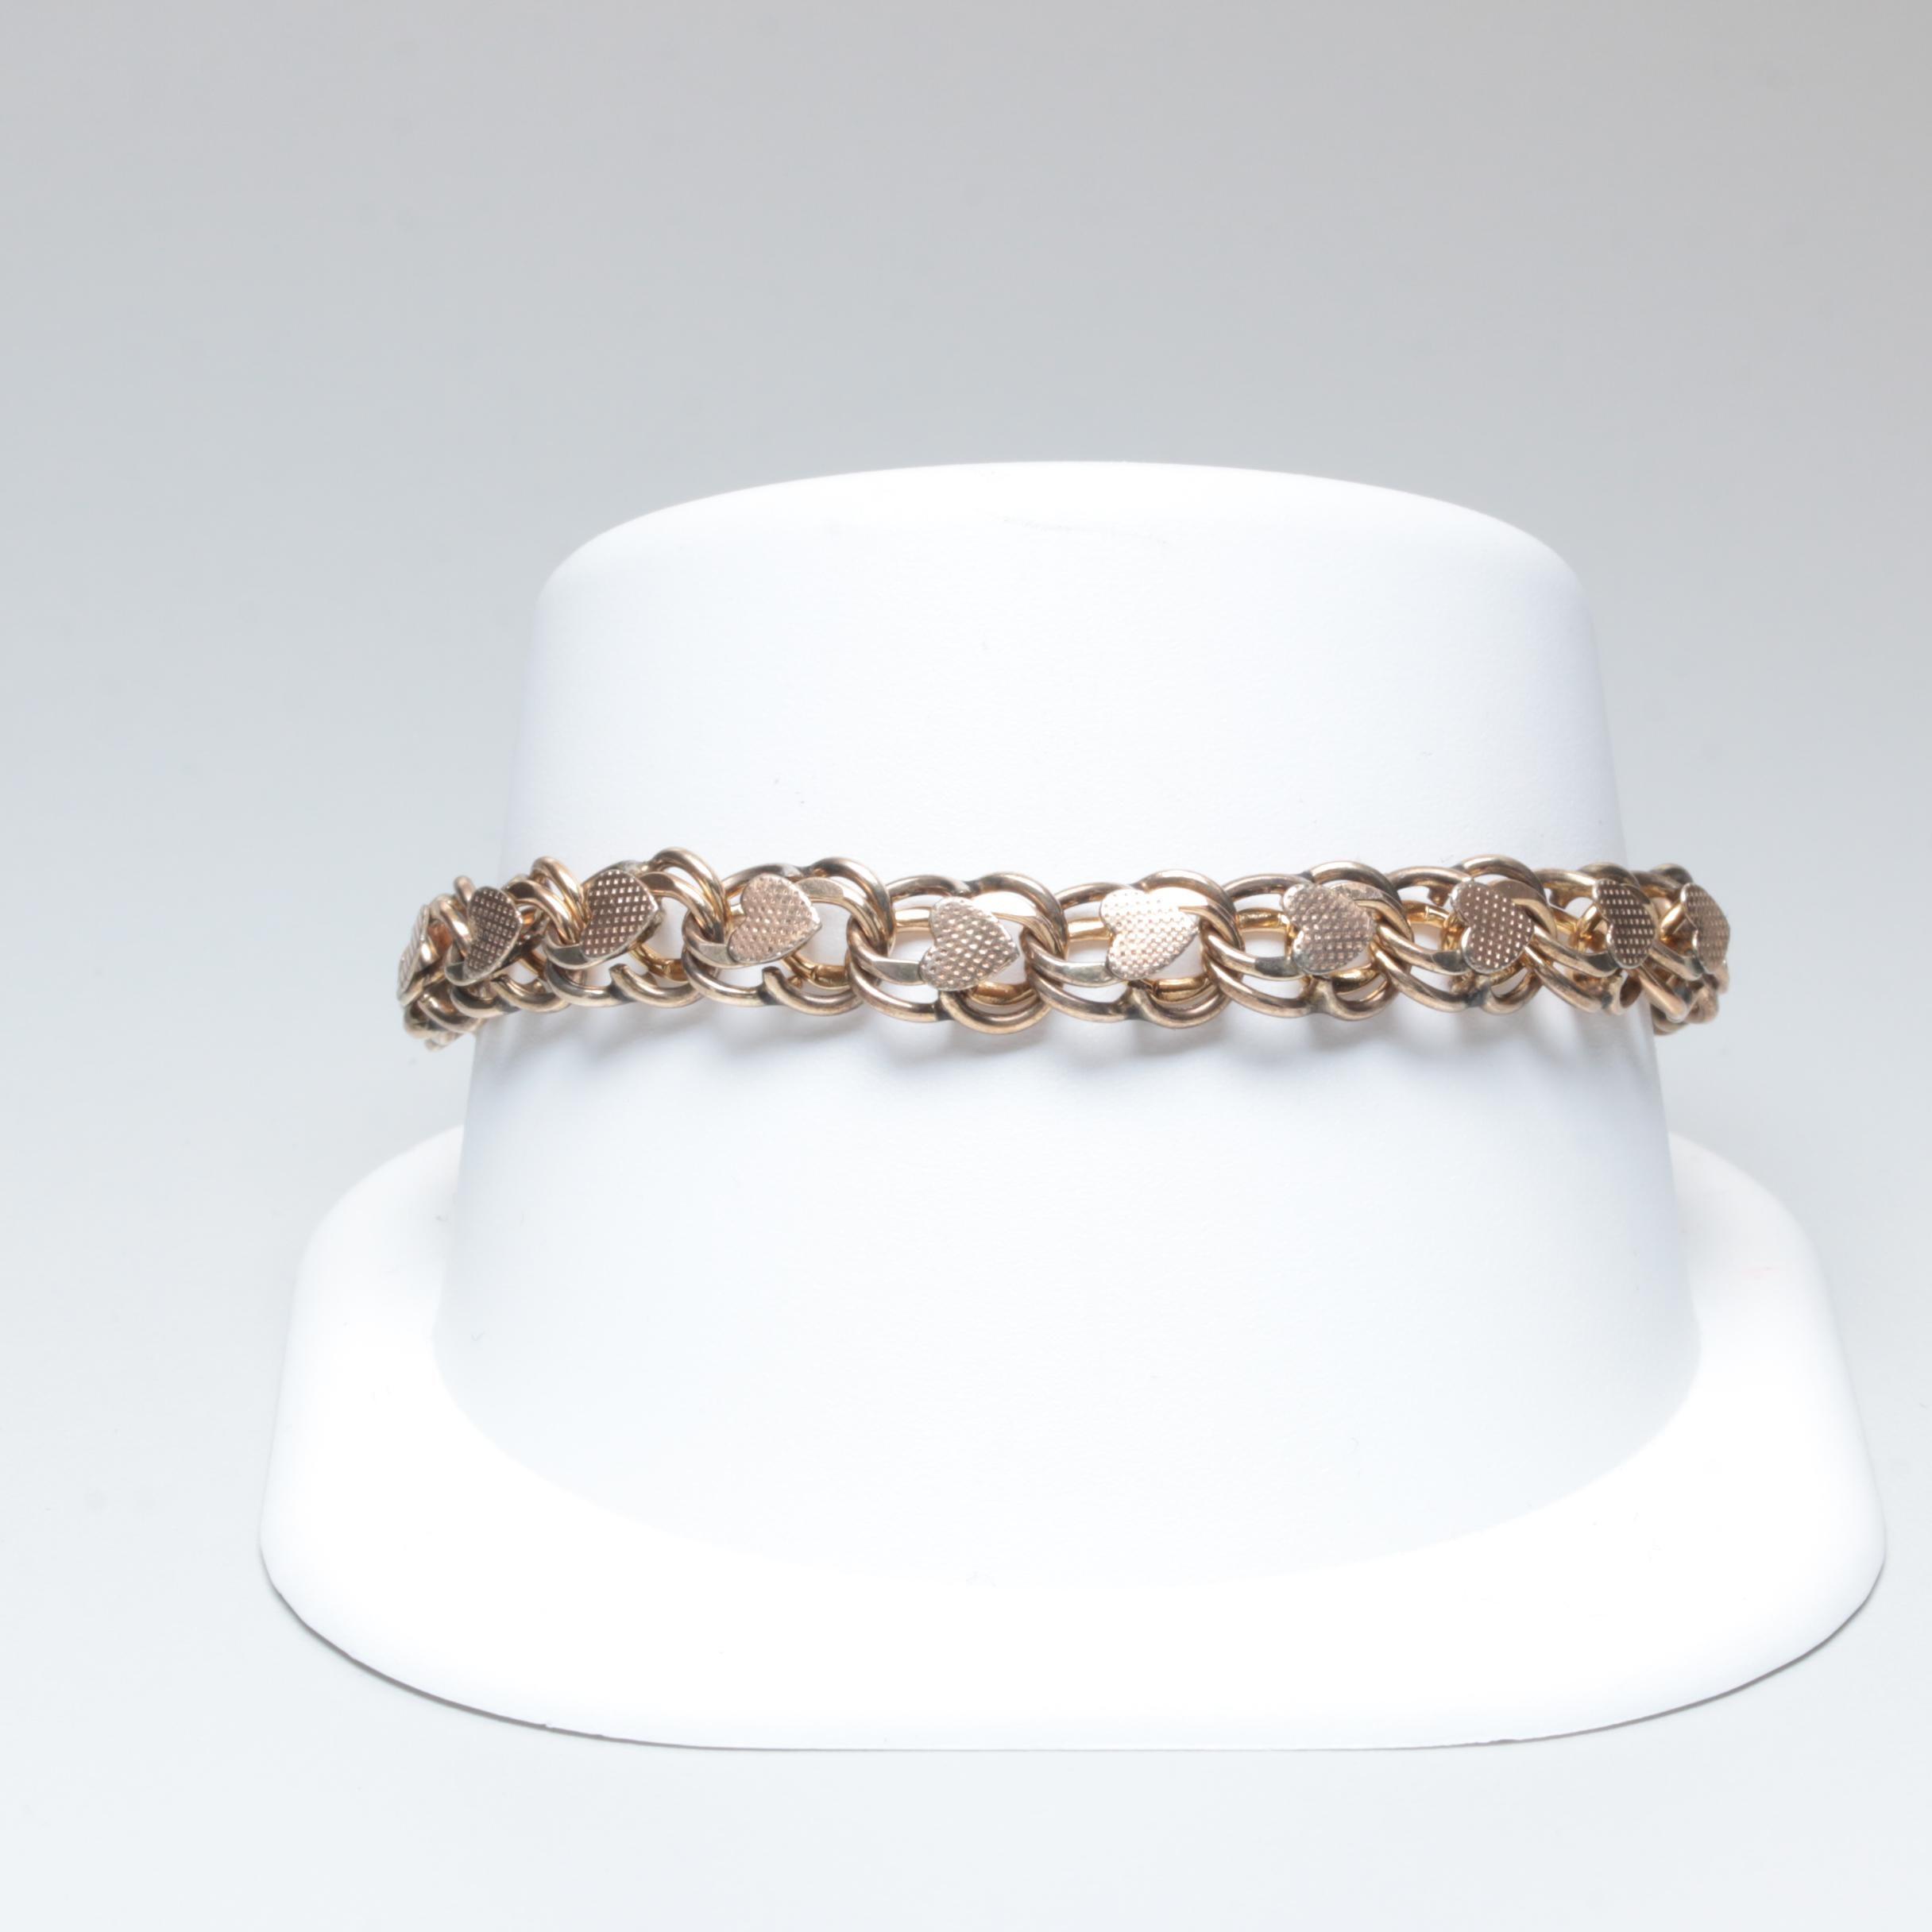 Victorian Gold Filled Heart Motif Bracelet